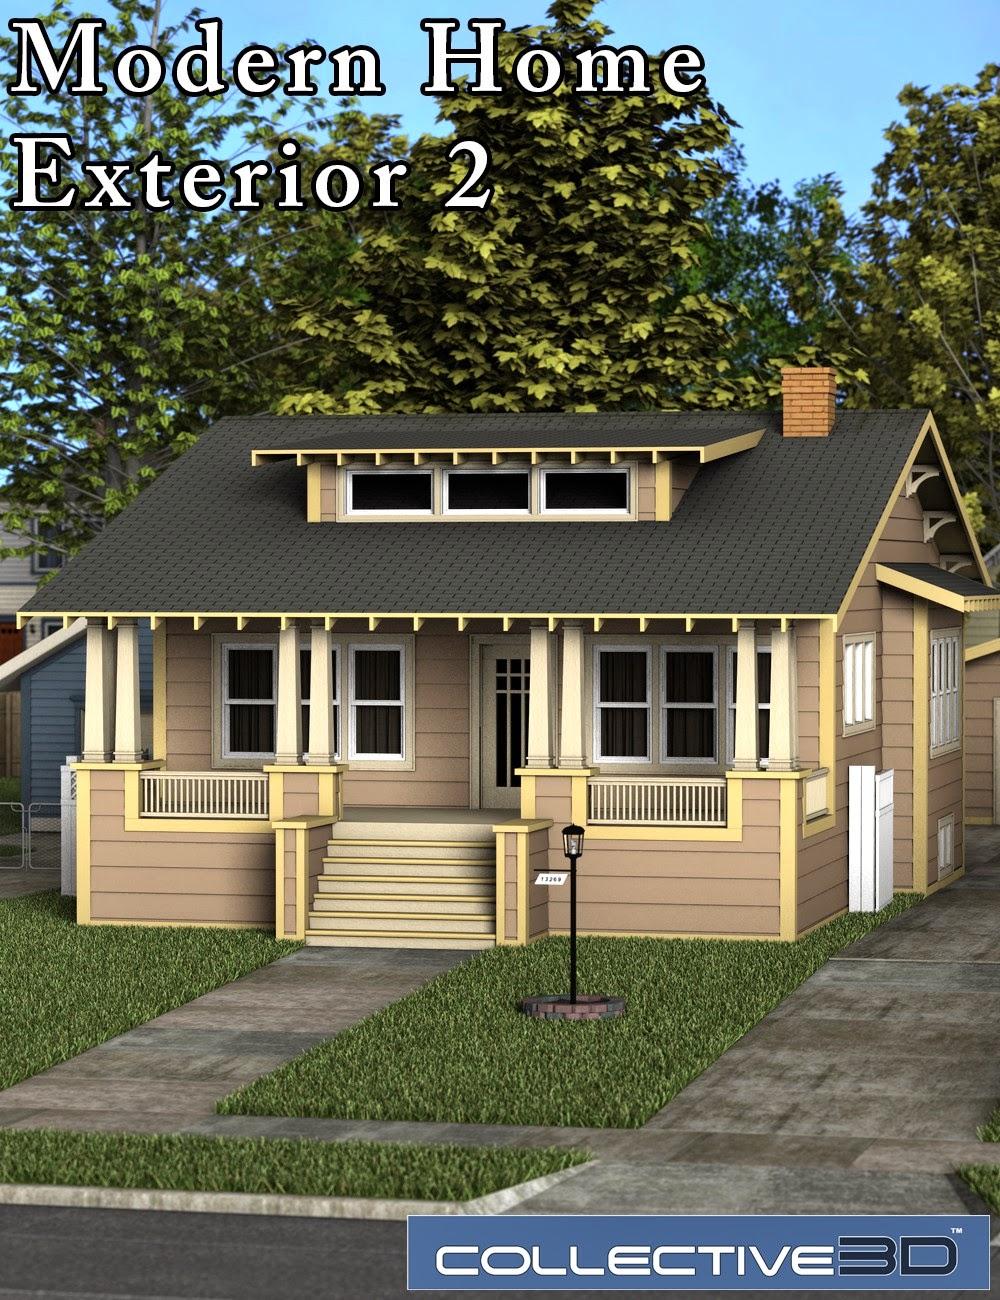 Collective3d Modern Home Extérieur 2